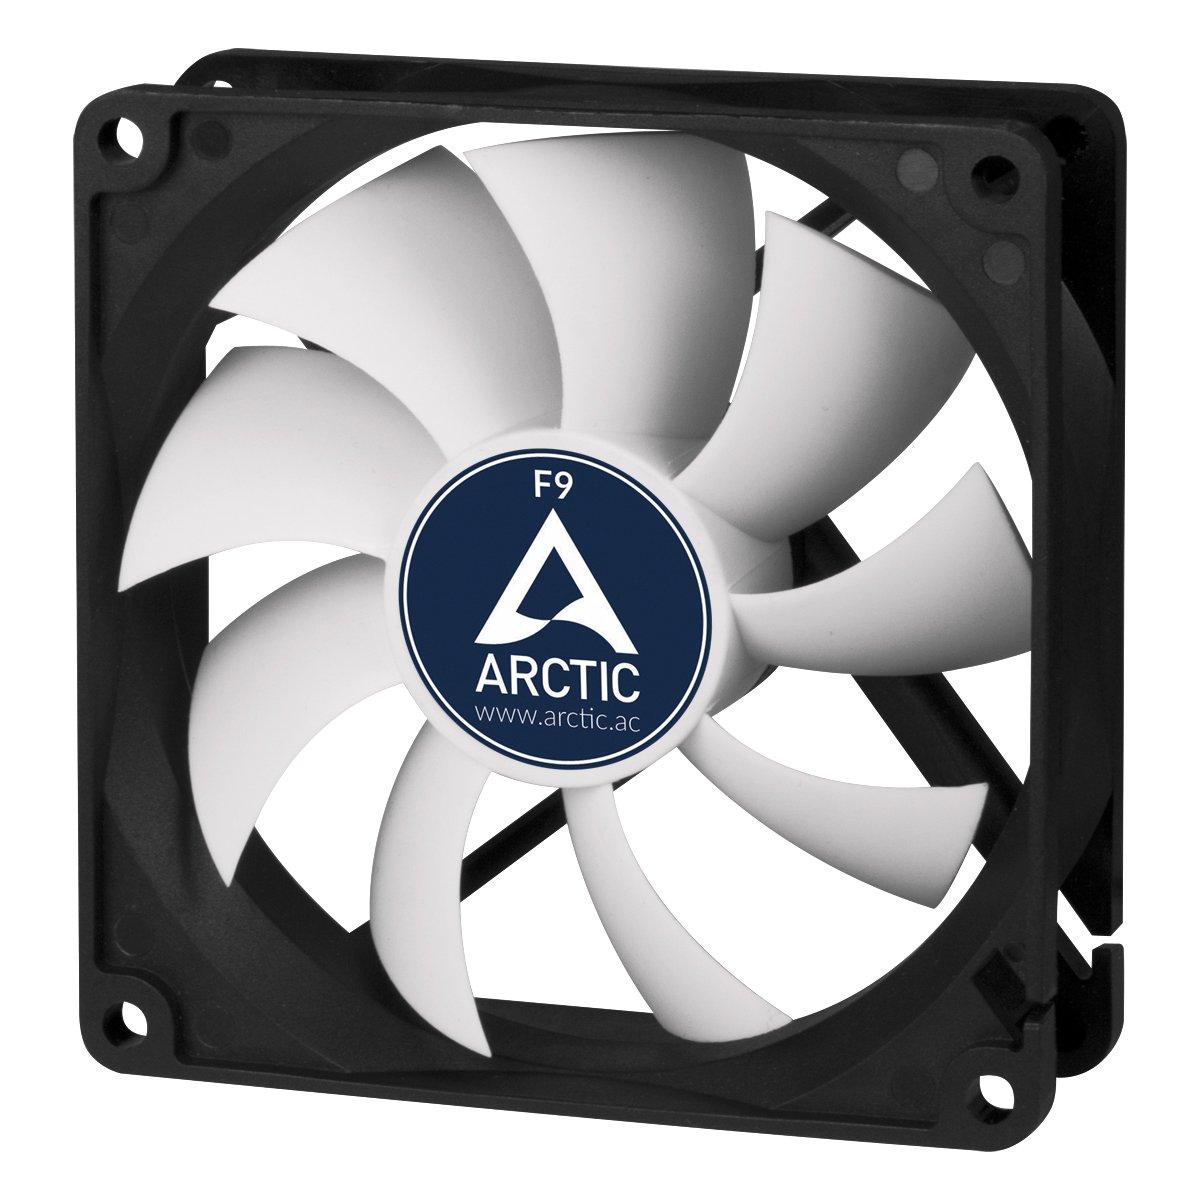 ARCTIC Standard Cooler Configuration possible